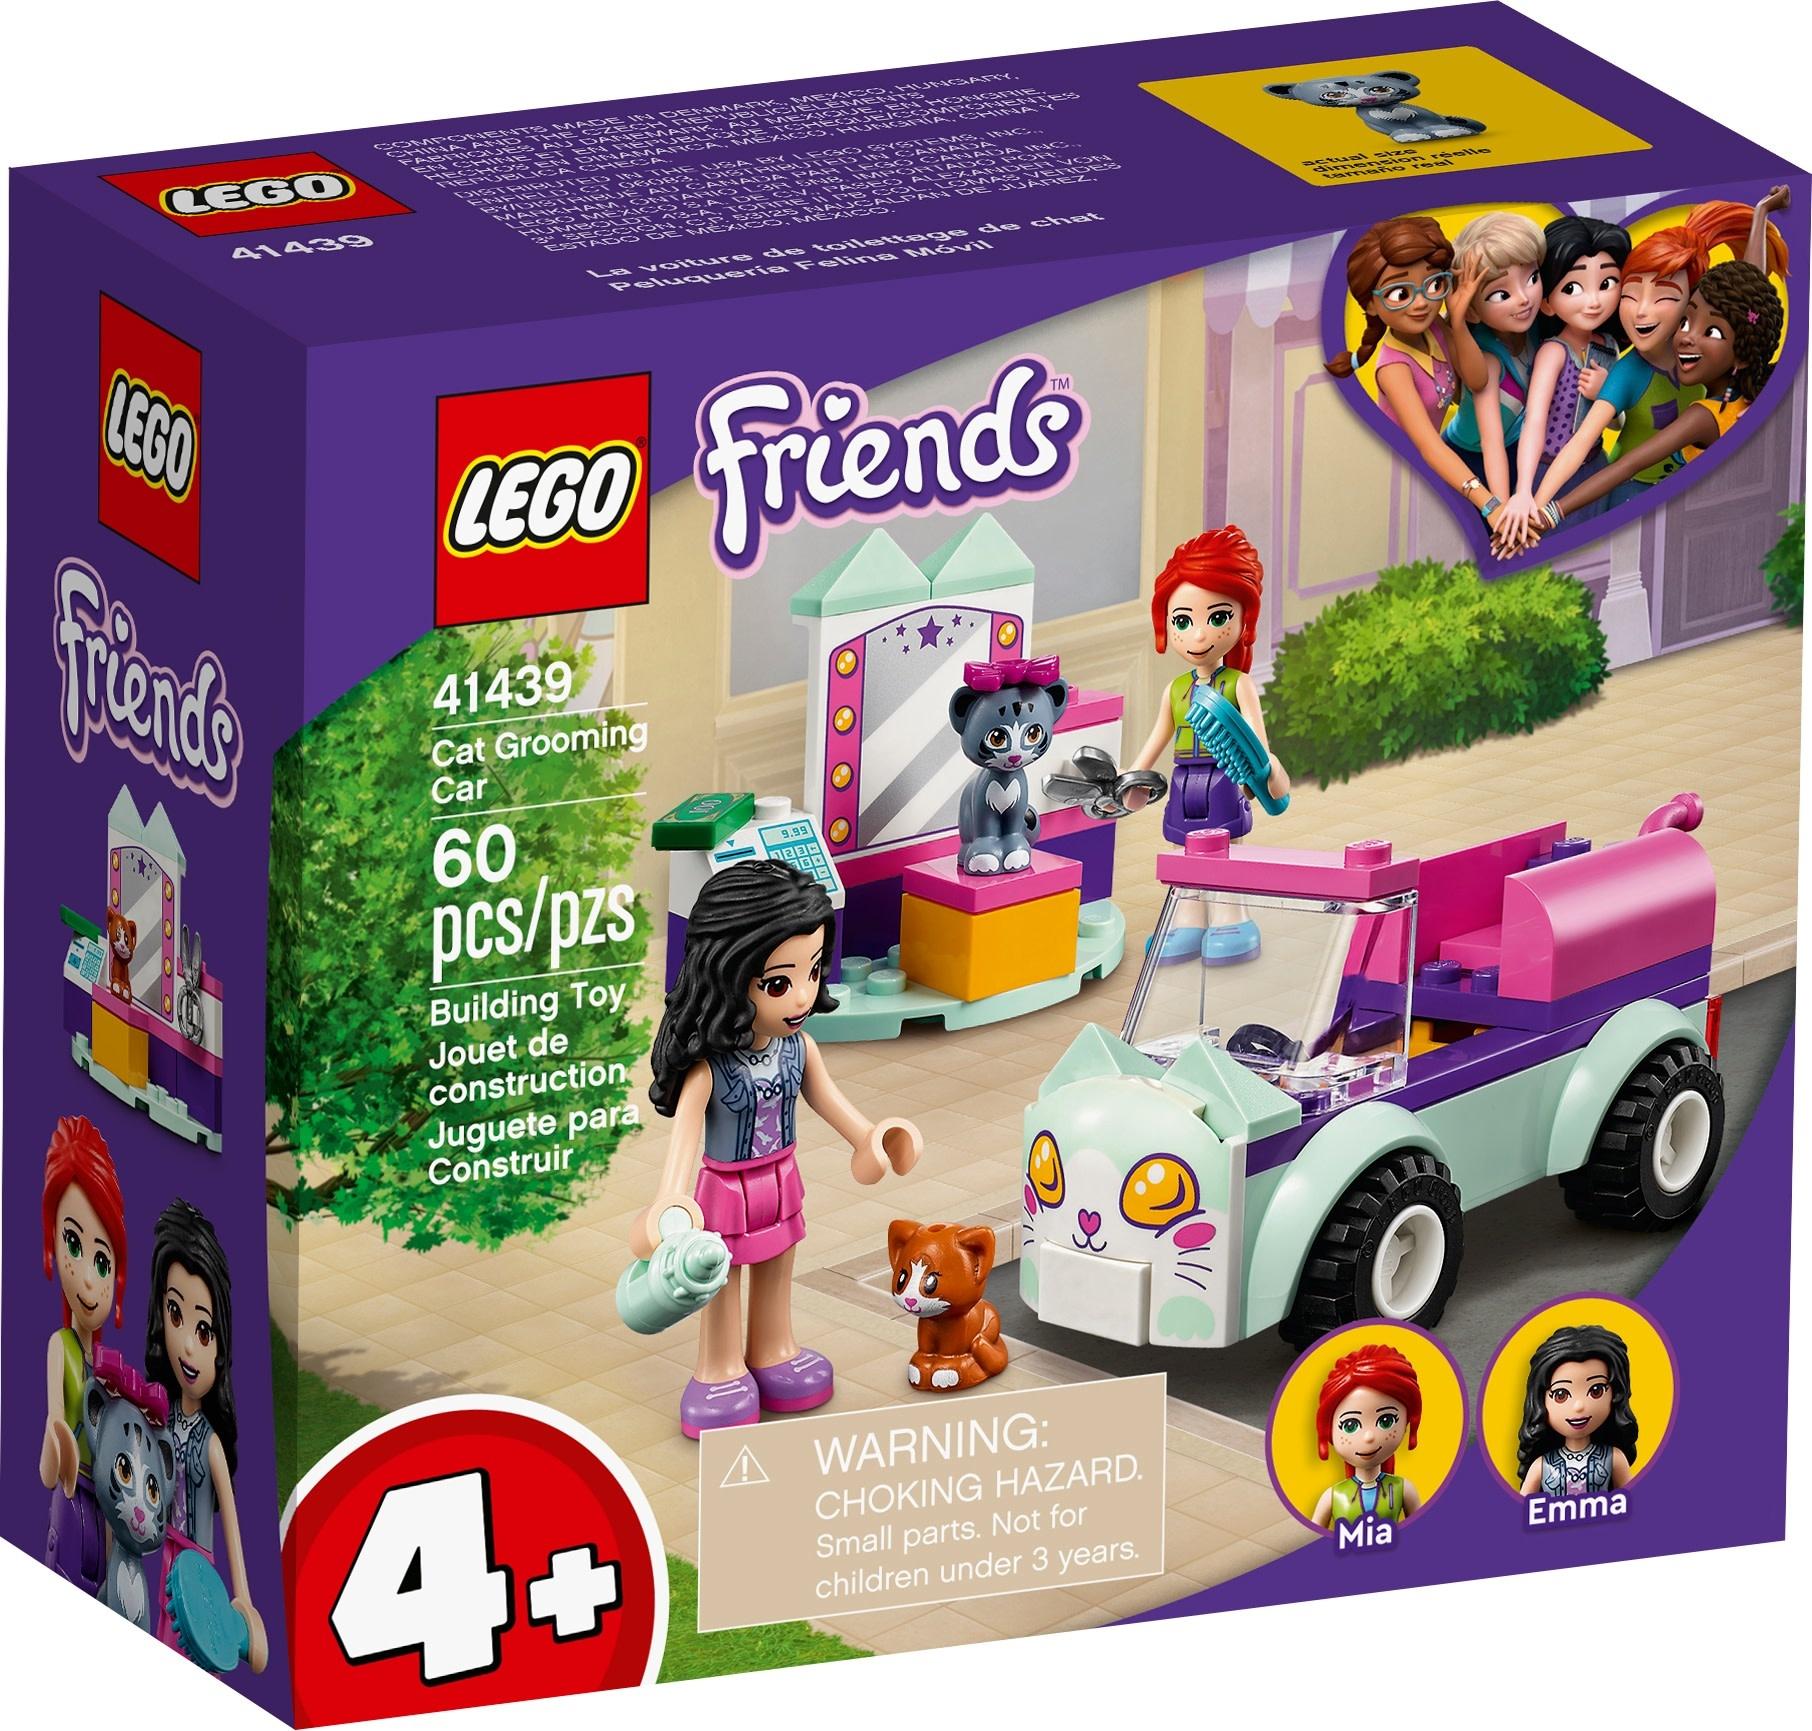 LEGO Friends Cat Grooming Car-1